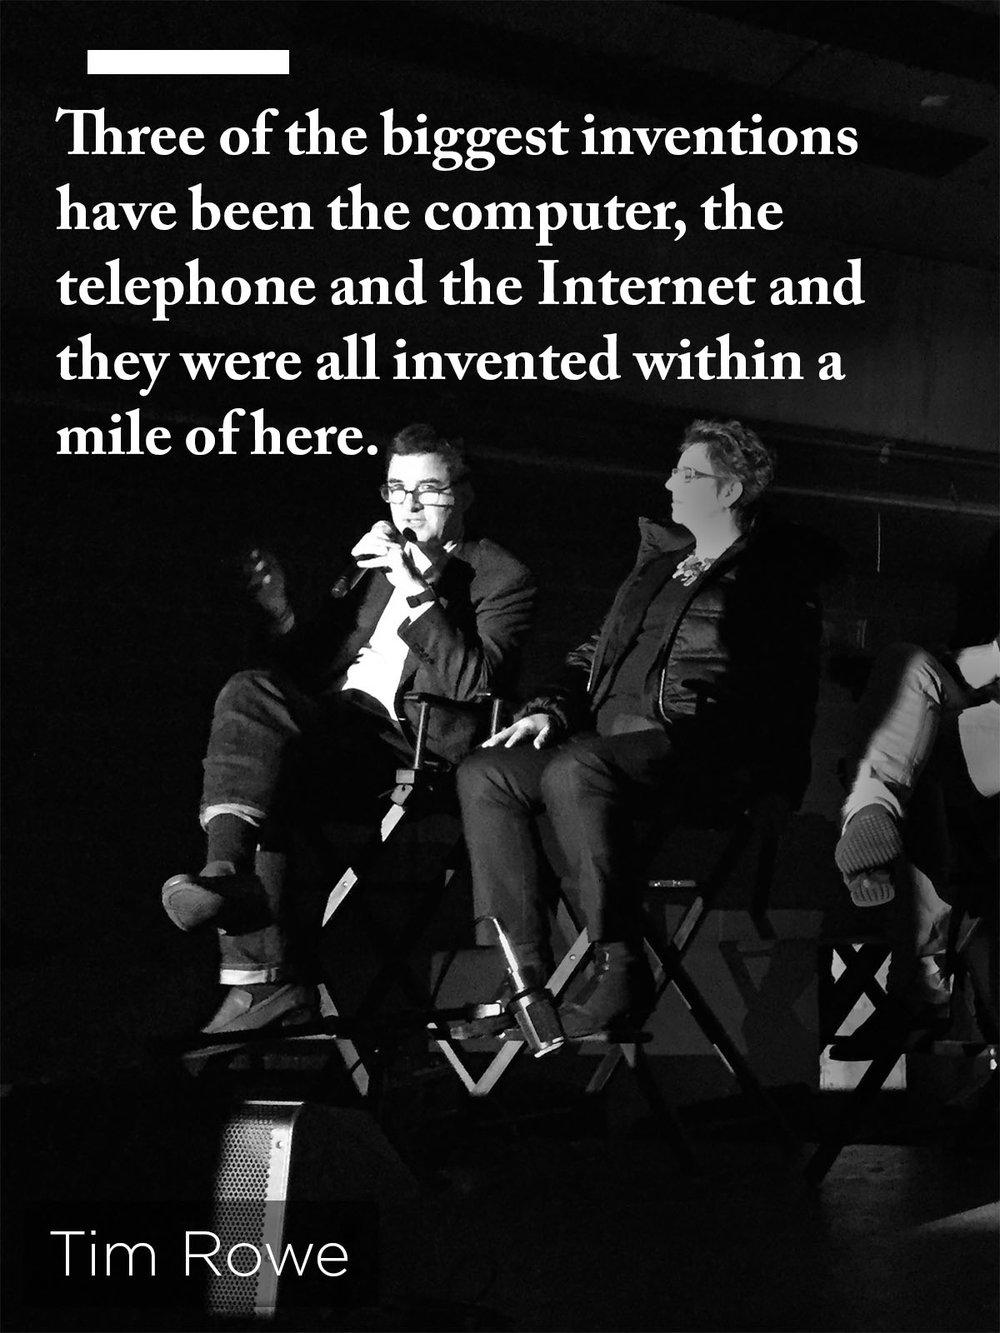 Hero Quotes - Tim Rowe.jpg